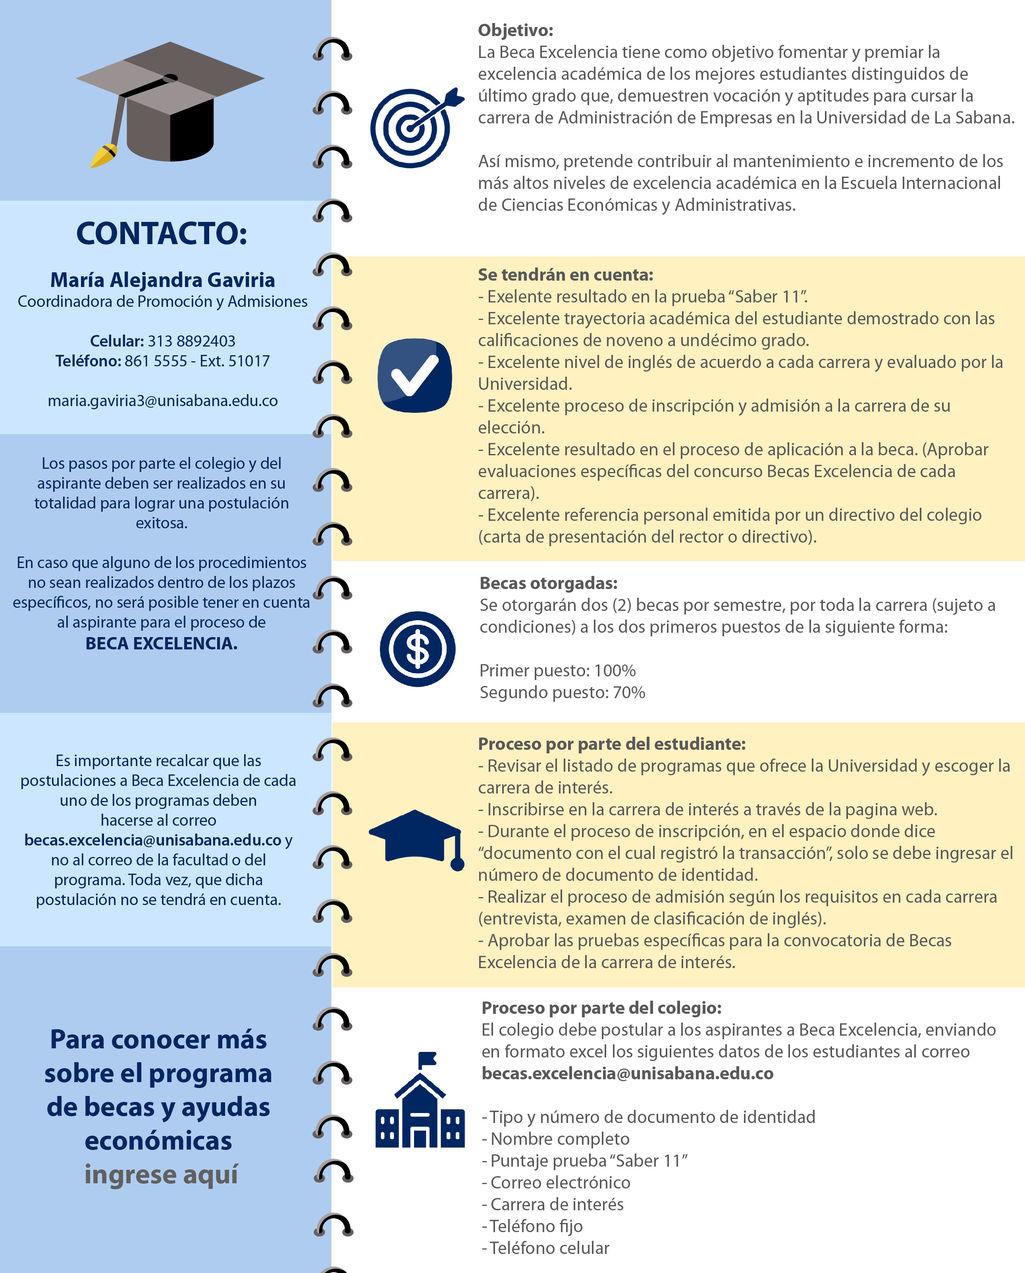 Beca-Excelencia-AE-Actualizado-Web-Escuela-USabana